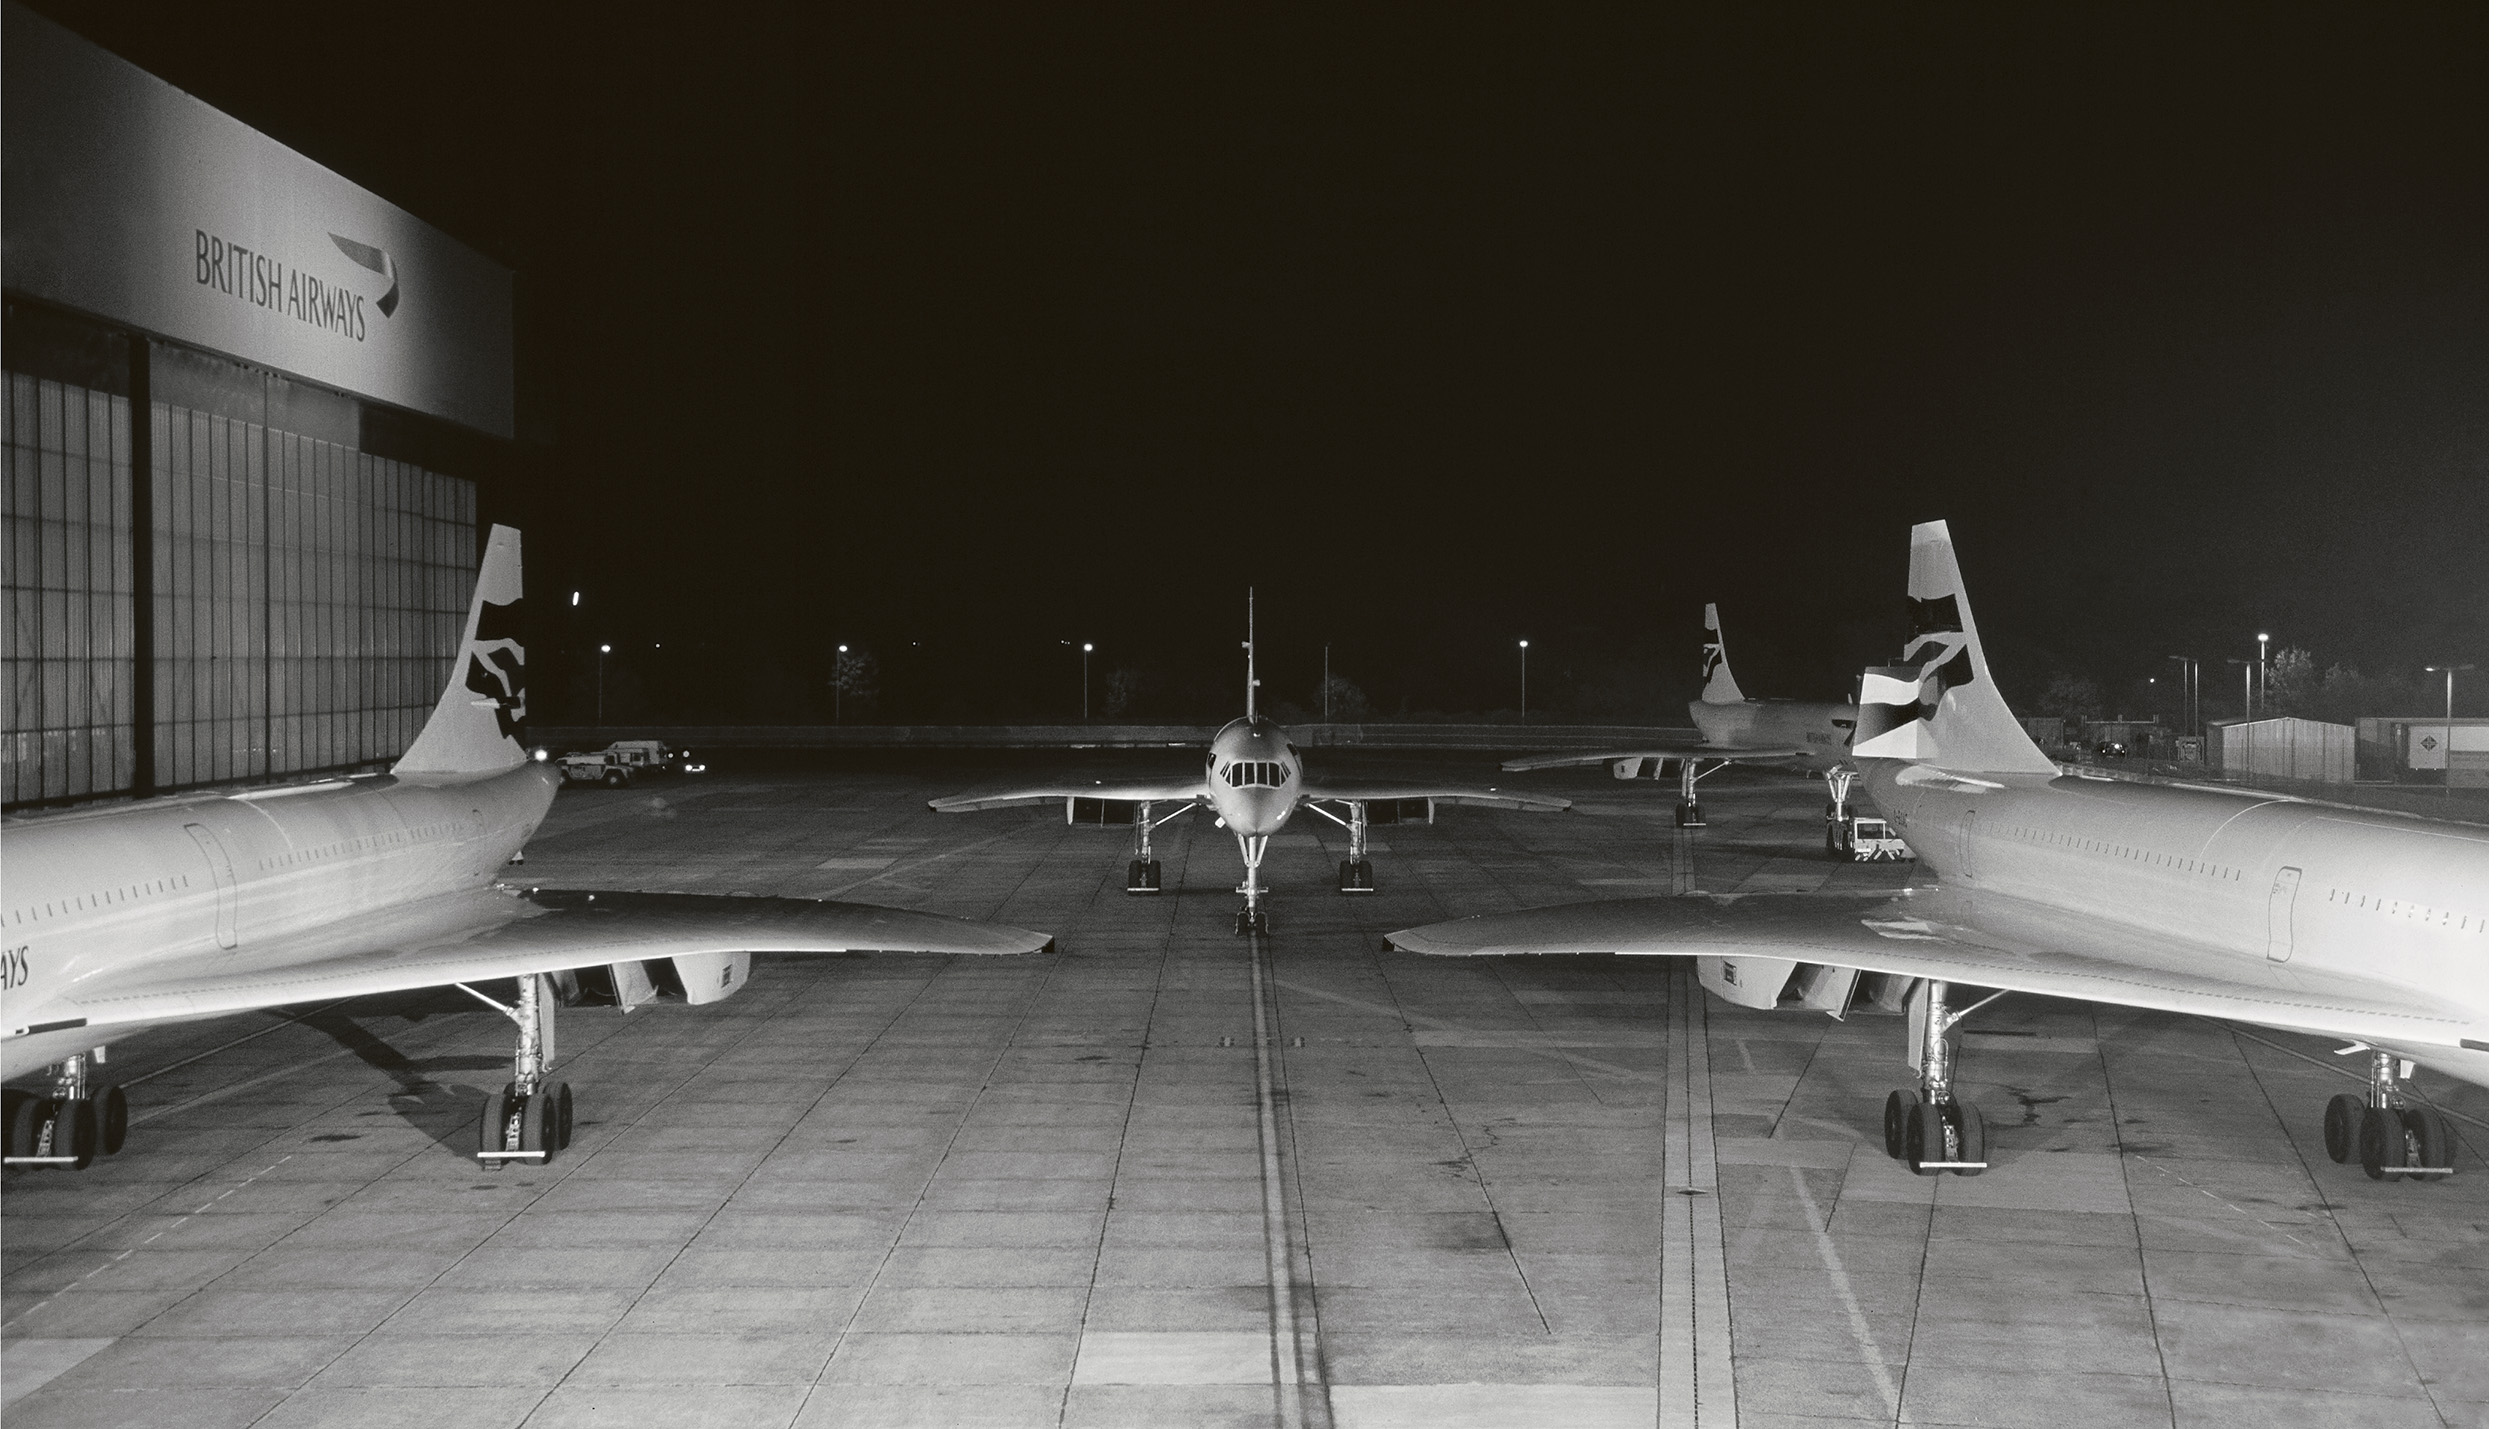 Last Day of Concorde